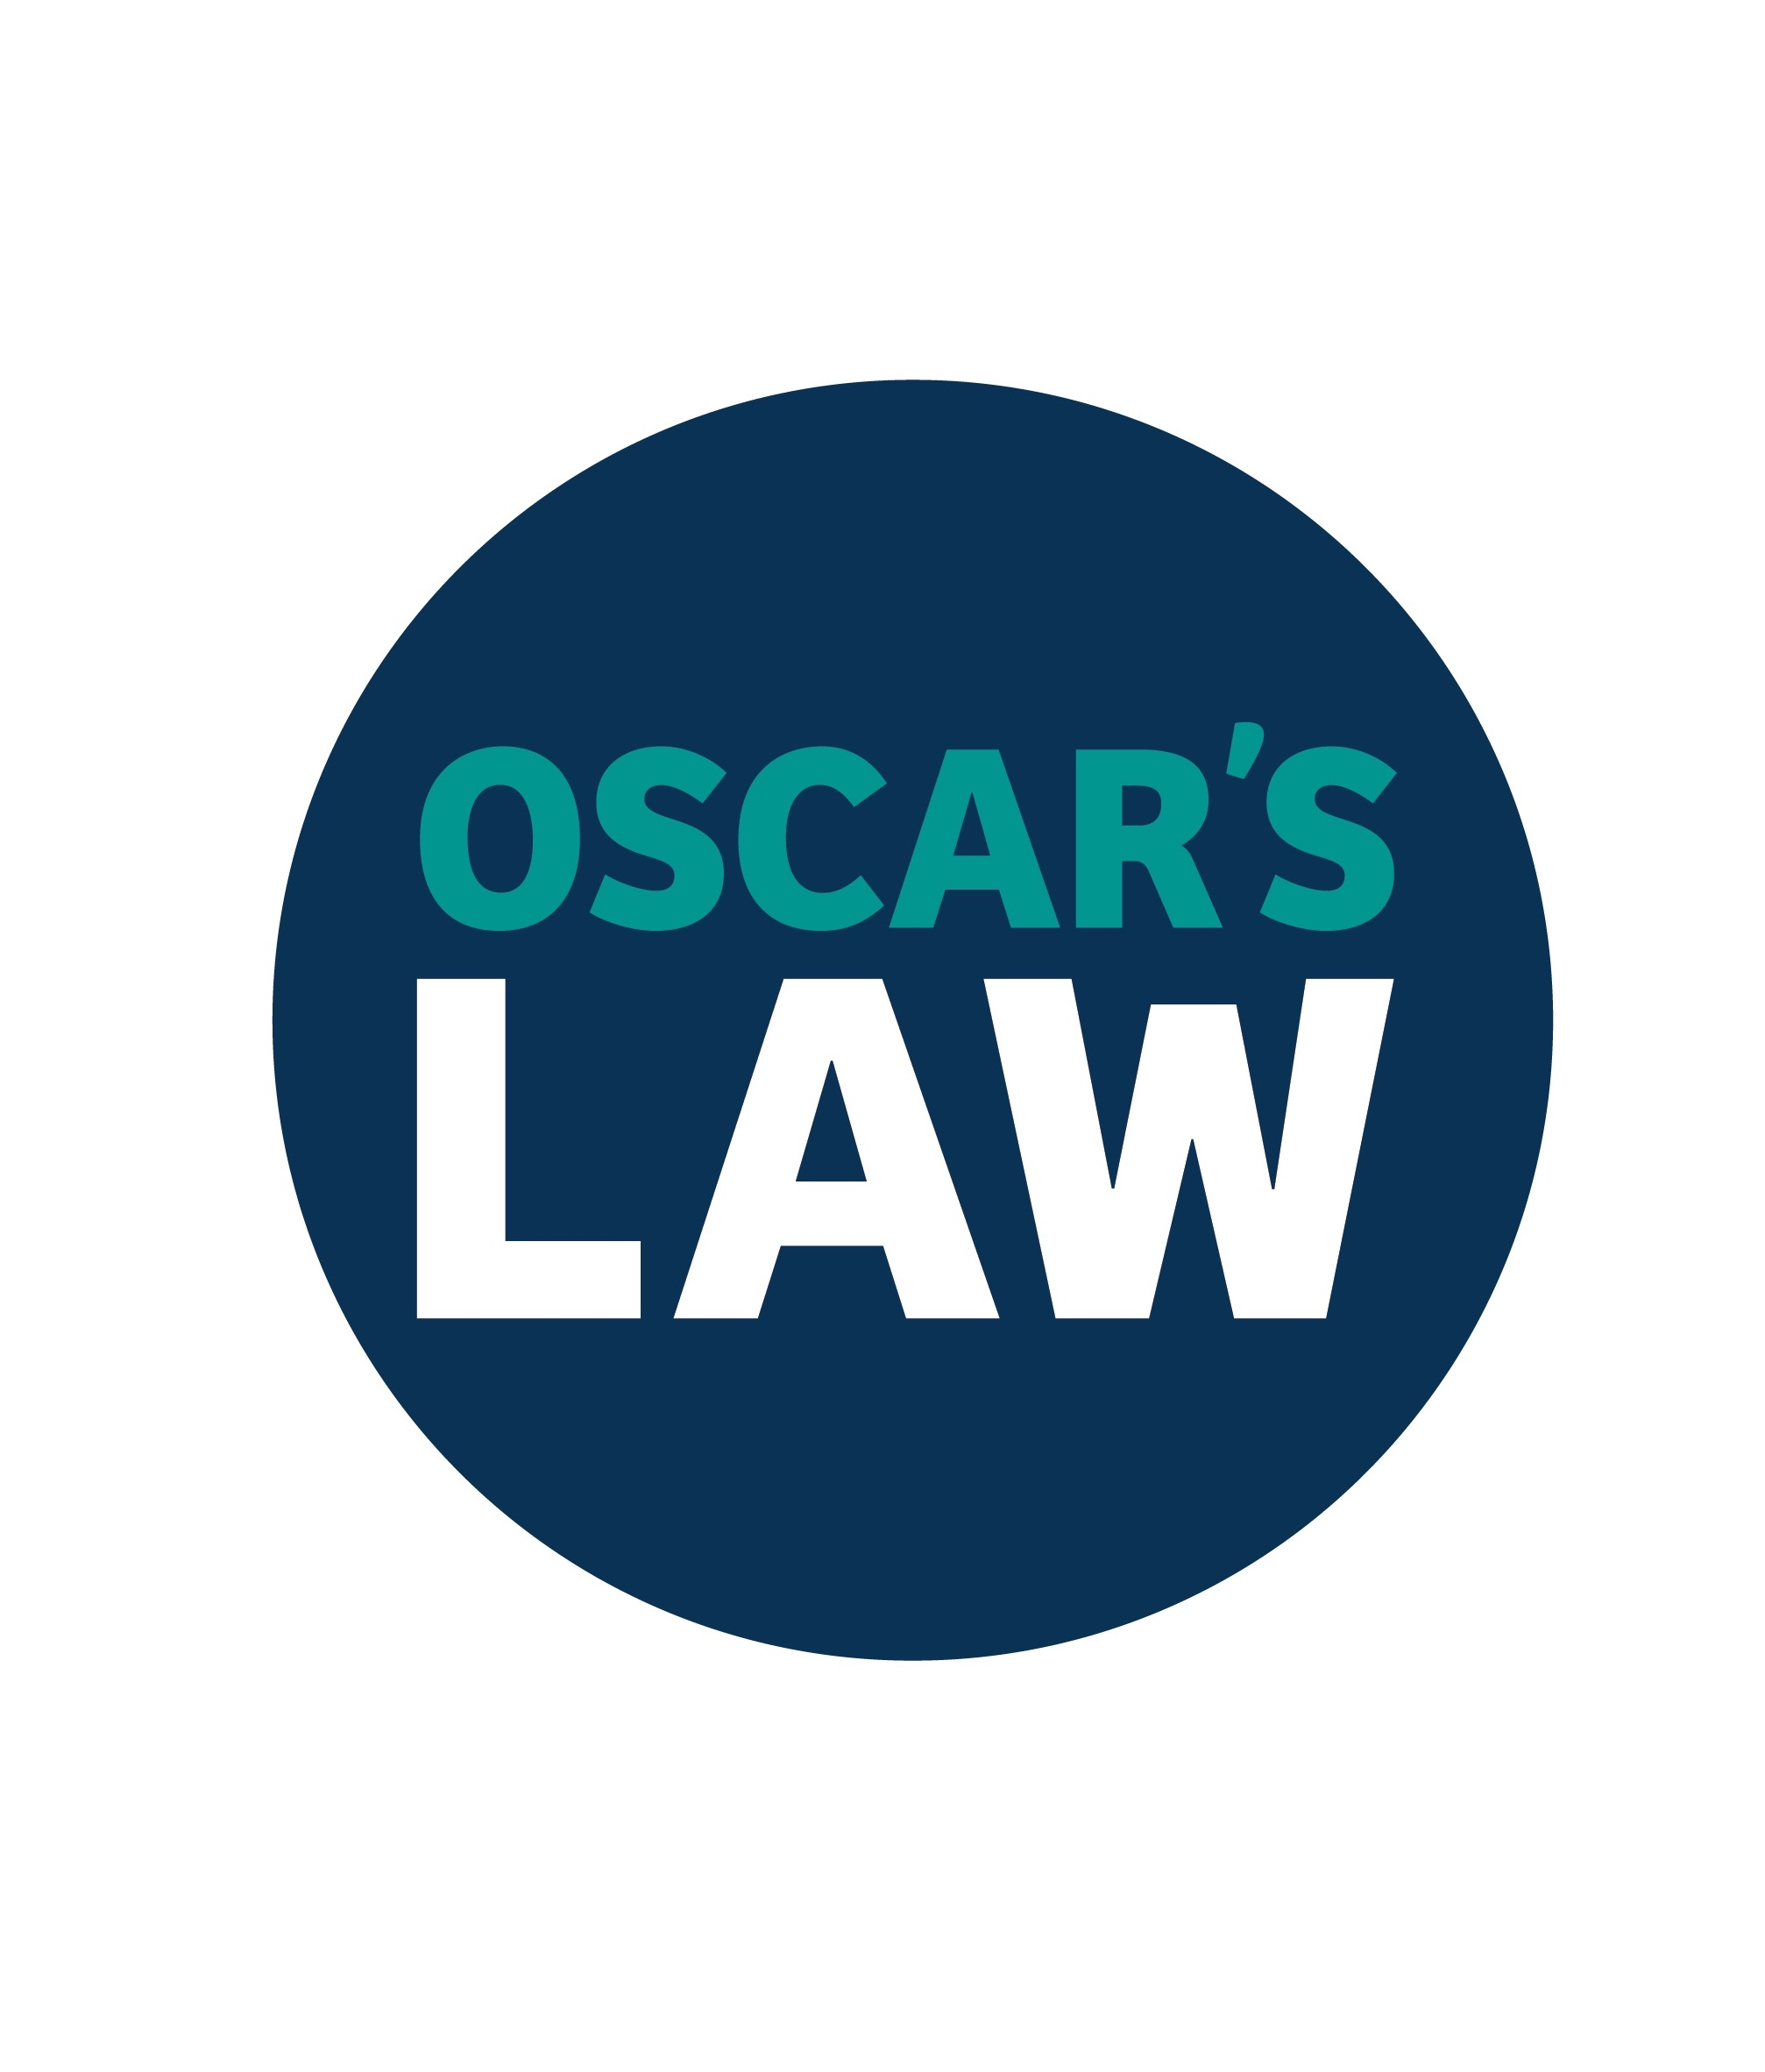 Oscar'sLaw_Logotype_Circle-01 copy 2.jpg